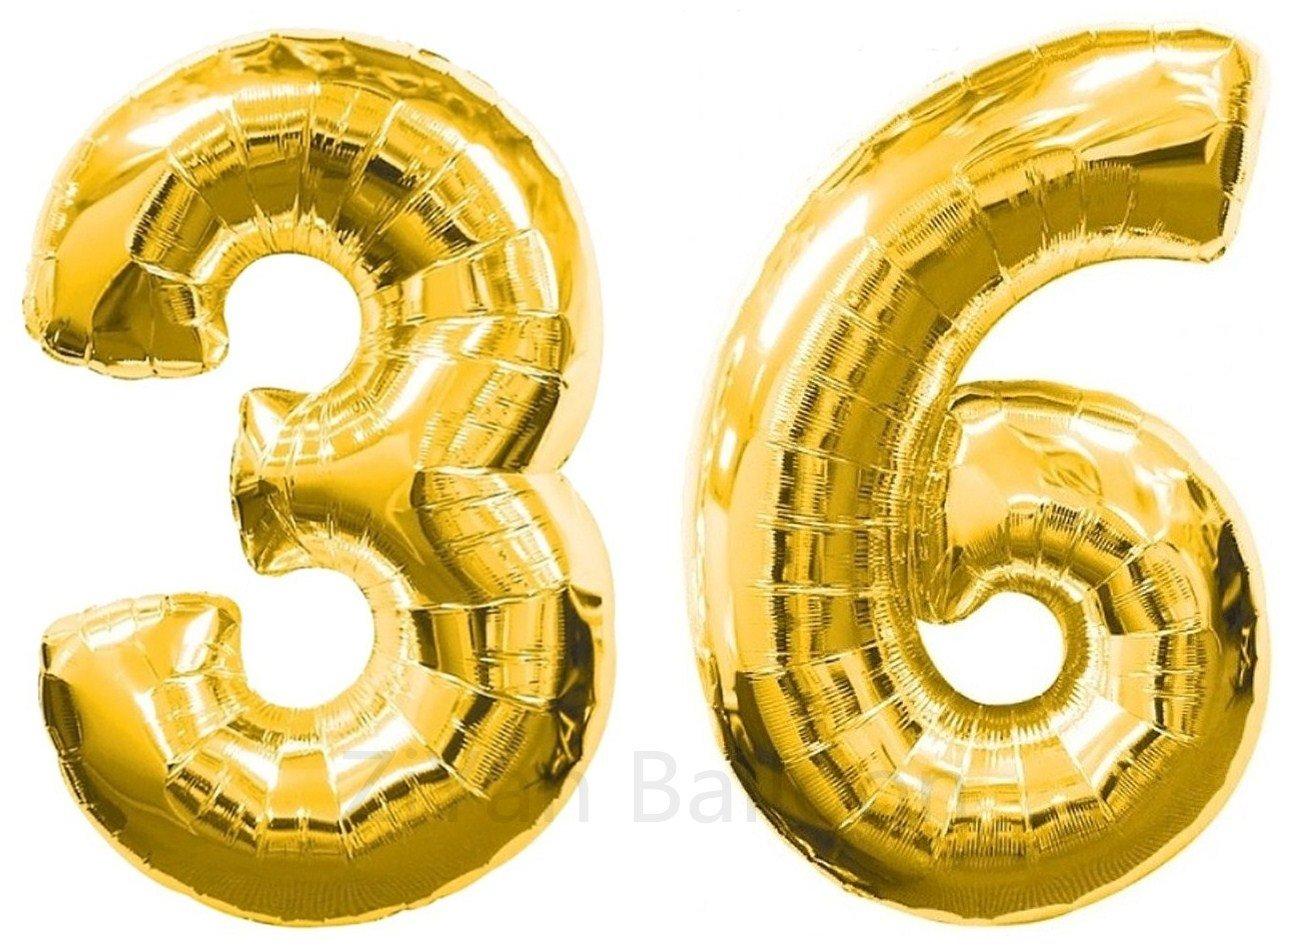 Ziyan 40インチGiant 36thゴールド番号バルーン、誕生日/パーティーバルーン   B076JDPSV1